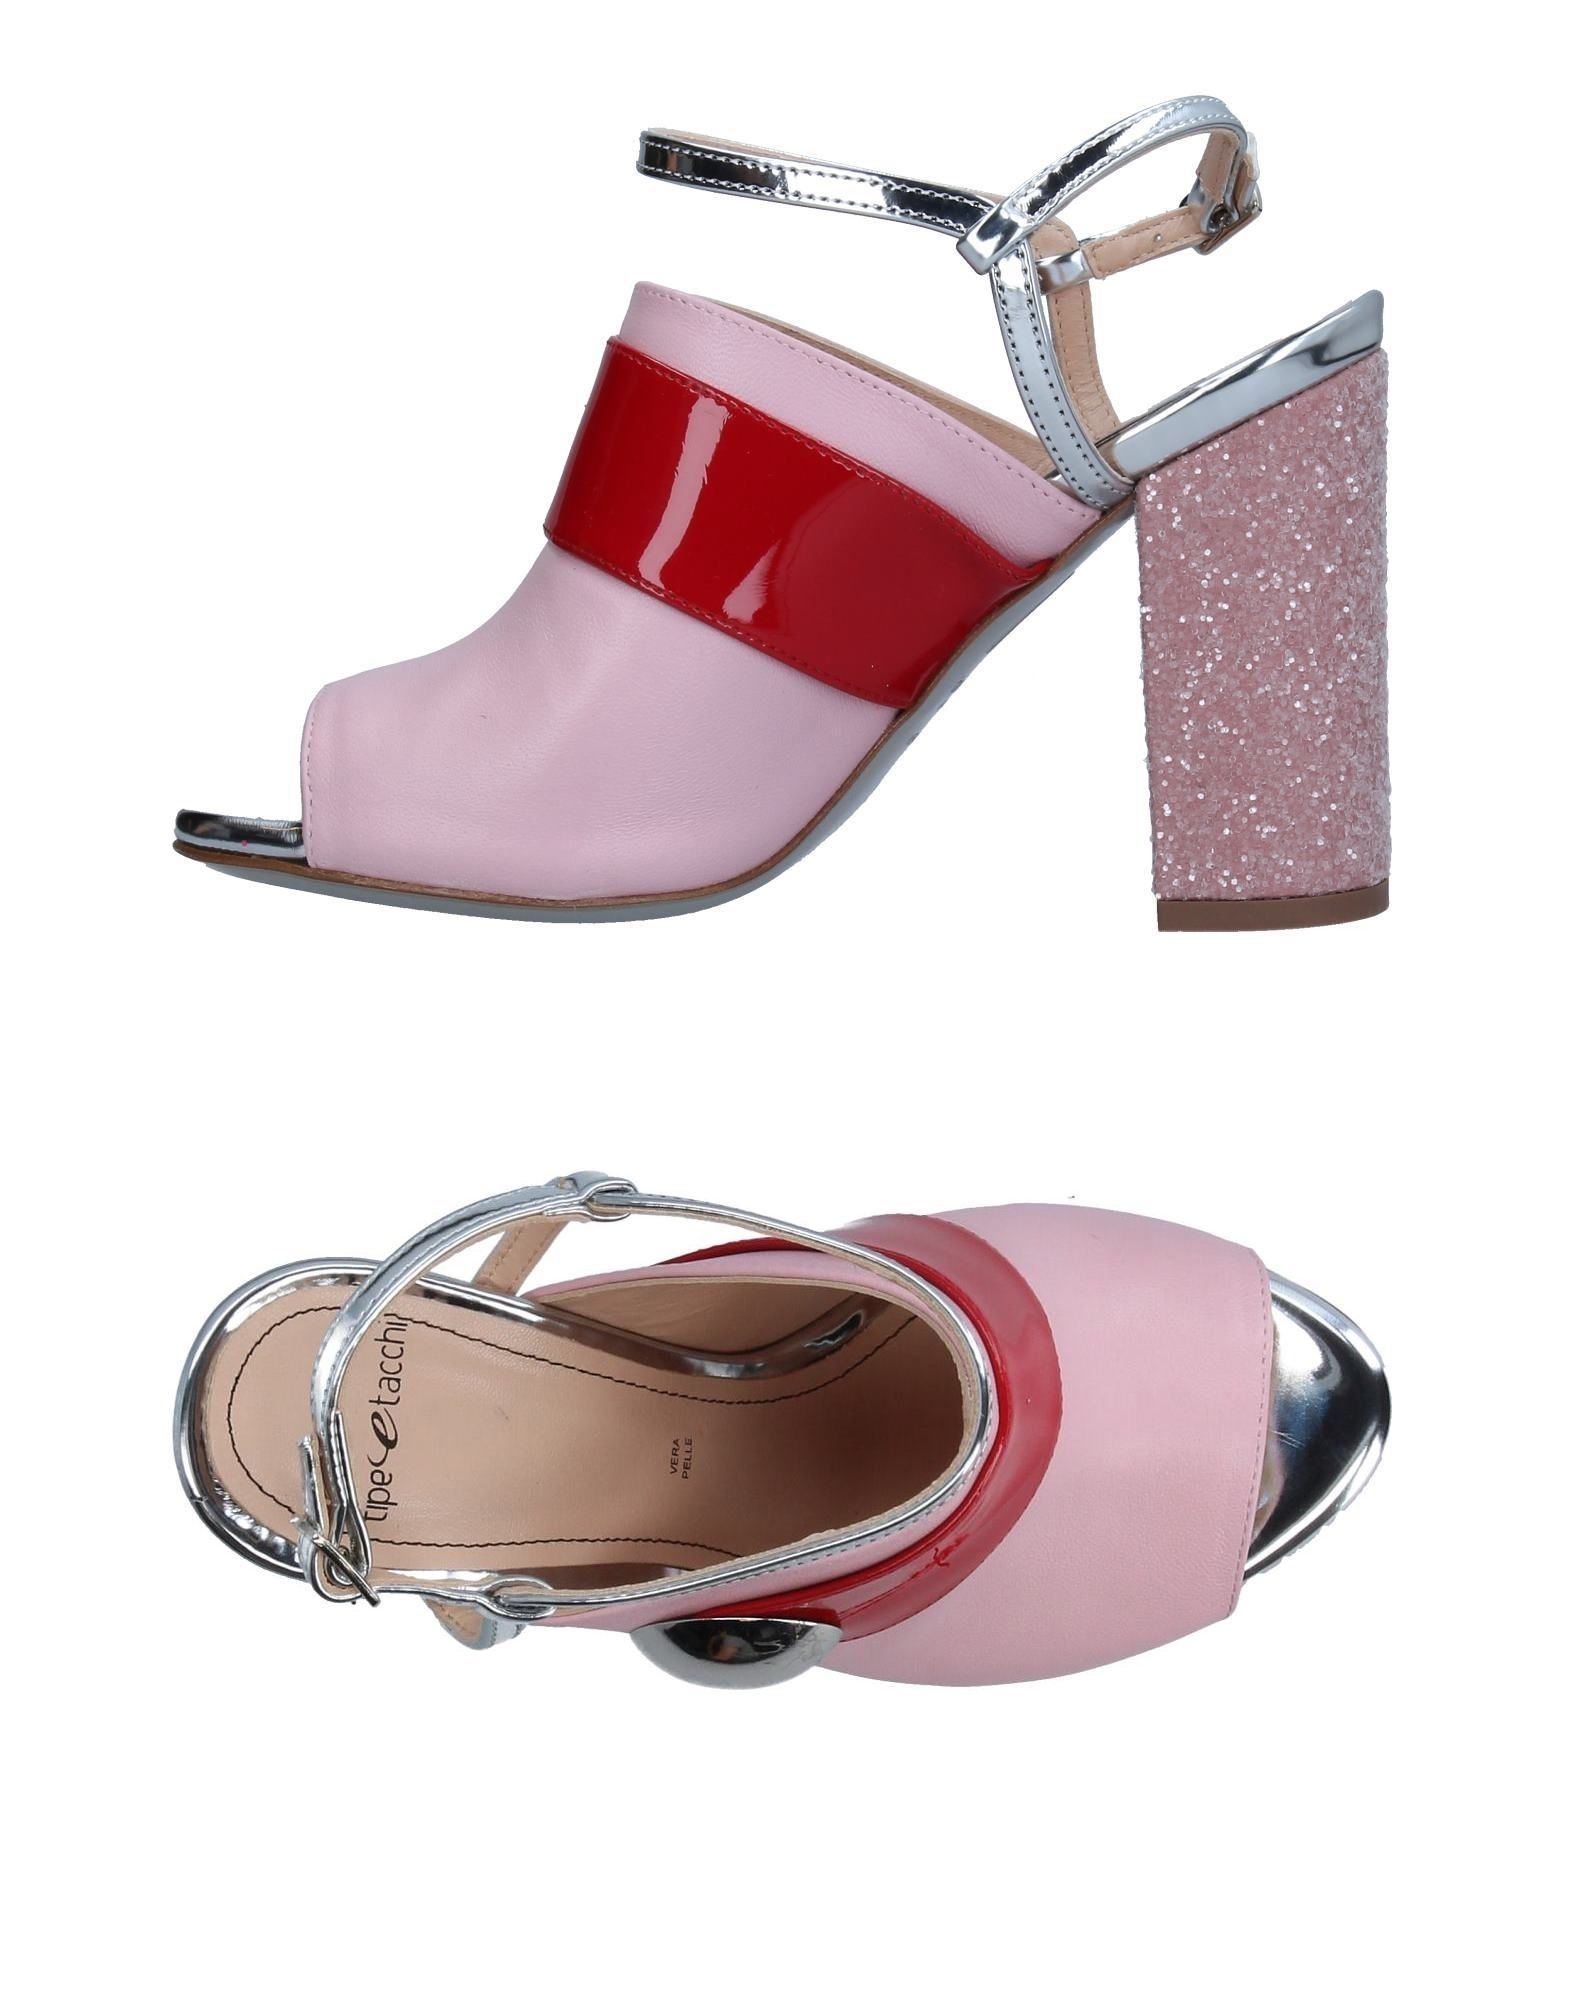 Tipe E Tacchi Sandalen Damen  11332492CX Gute Qualität beliebte Schuhe